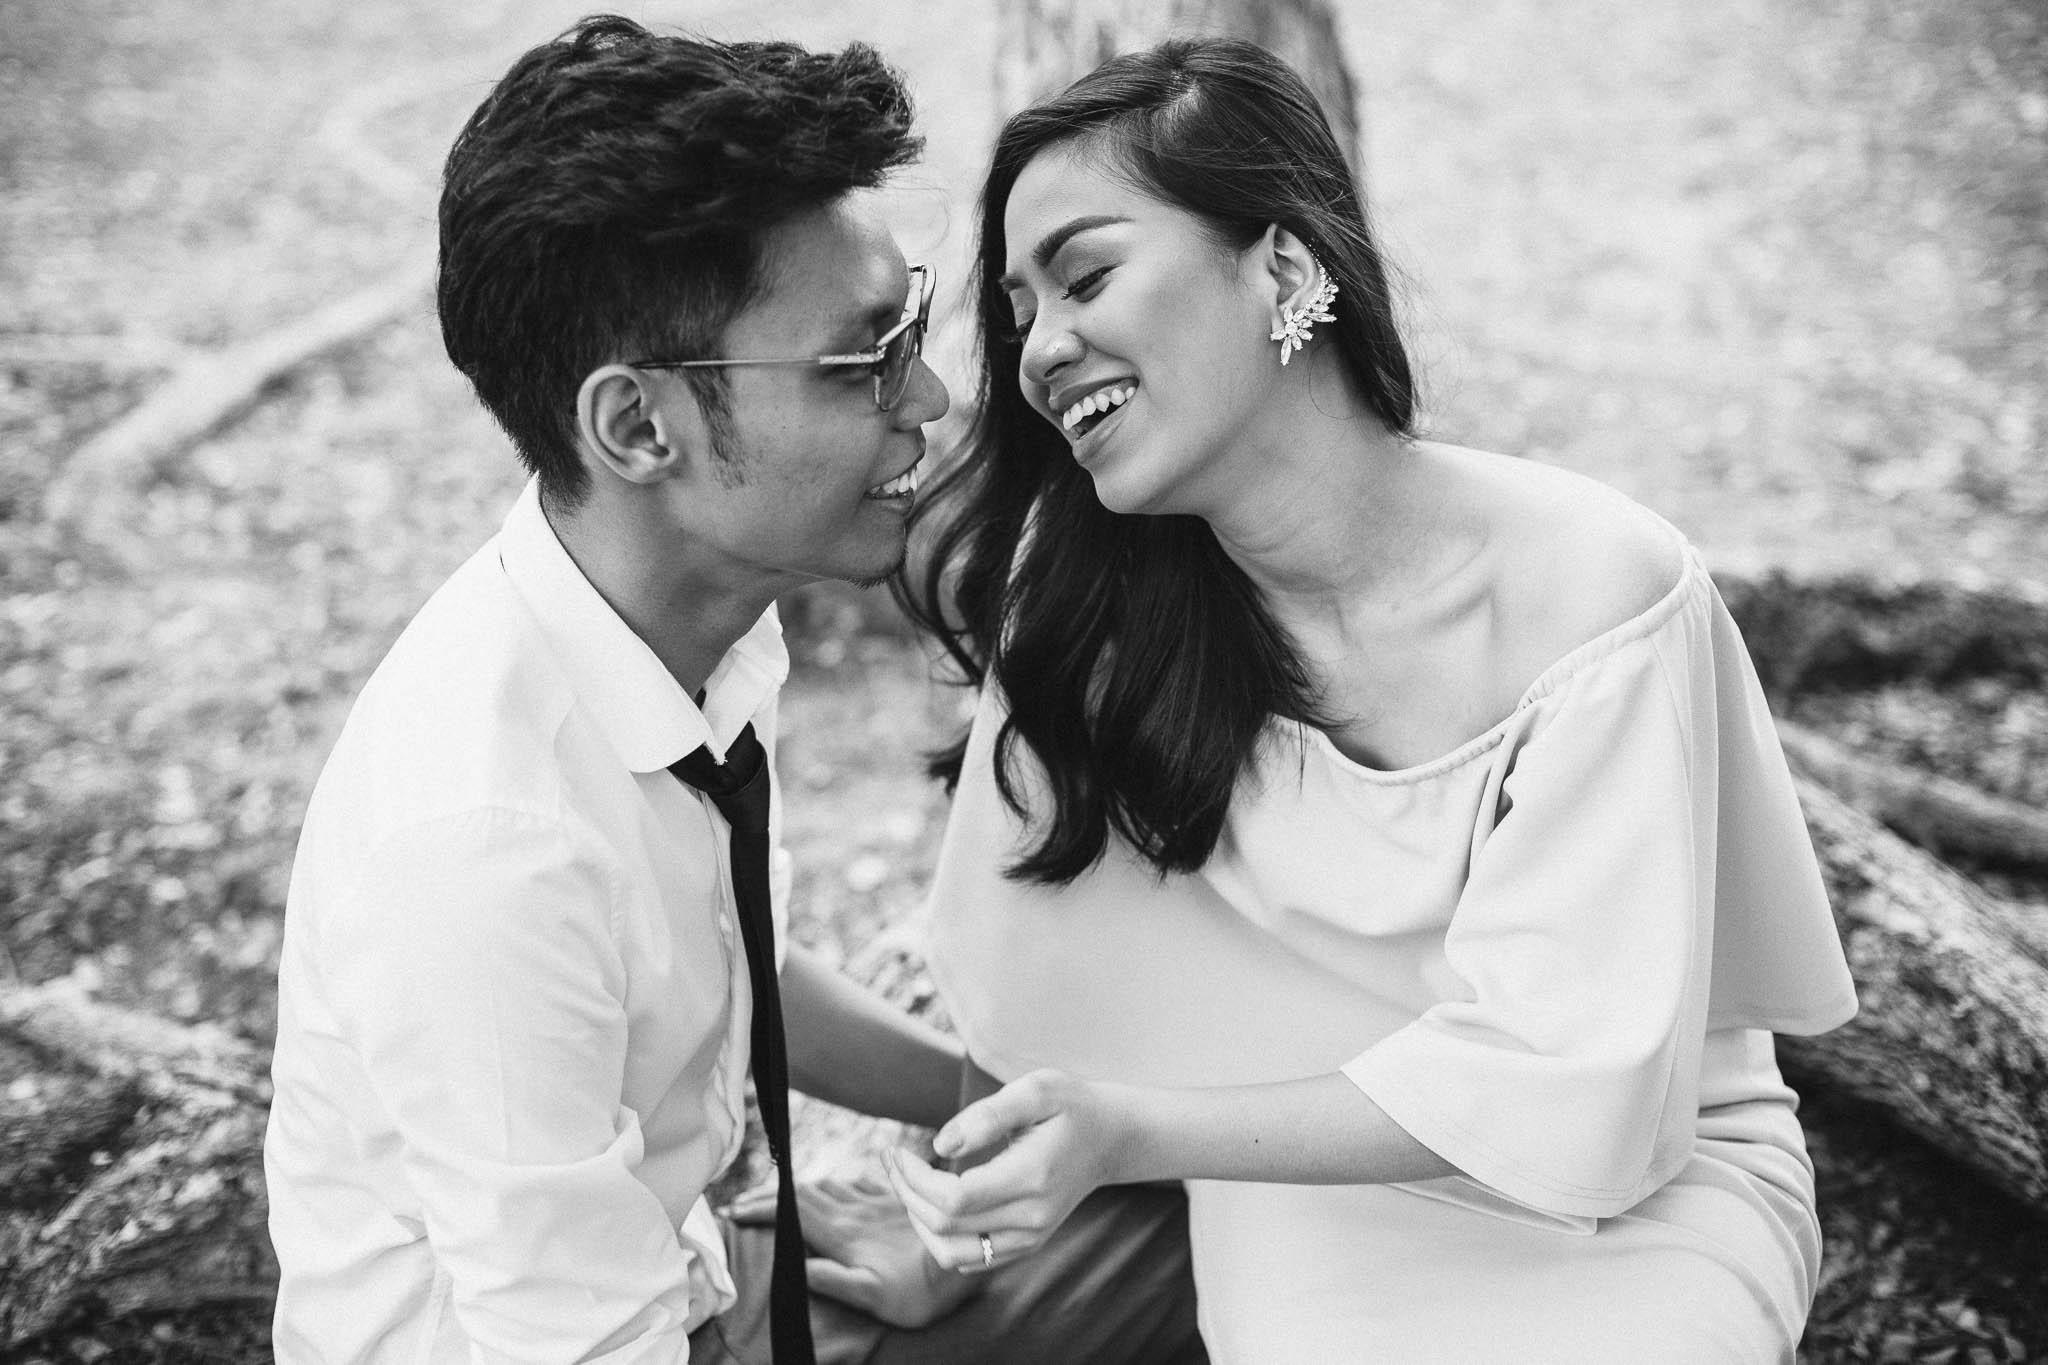 singapore-wedding-photographer-malay-travel-adli-tashah-24.jpg